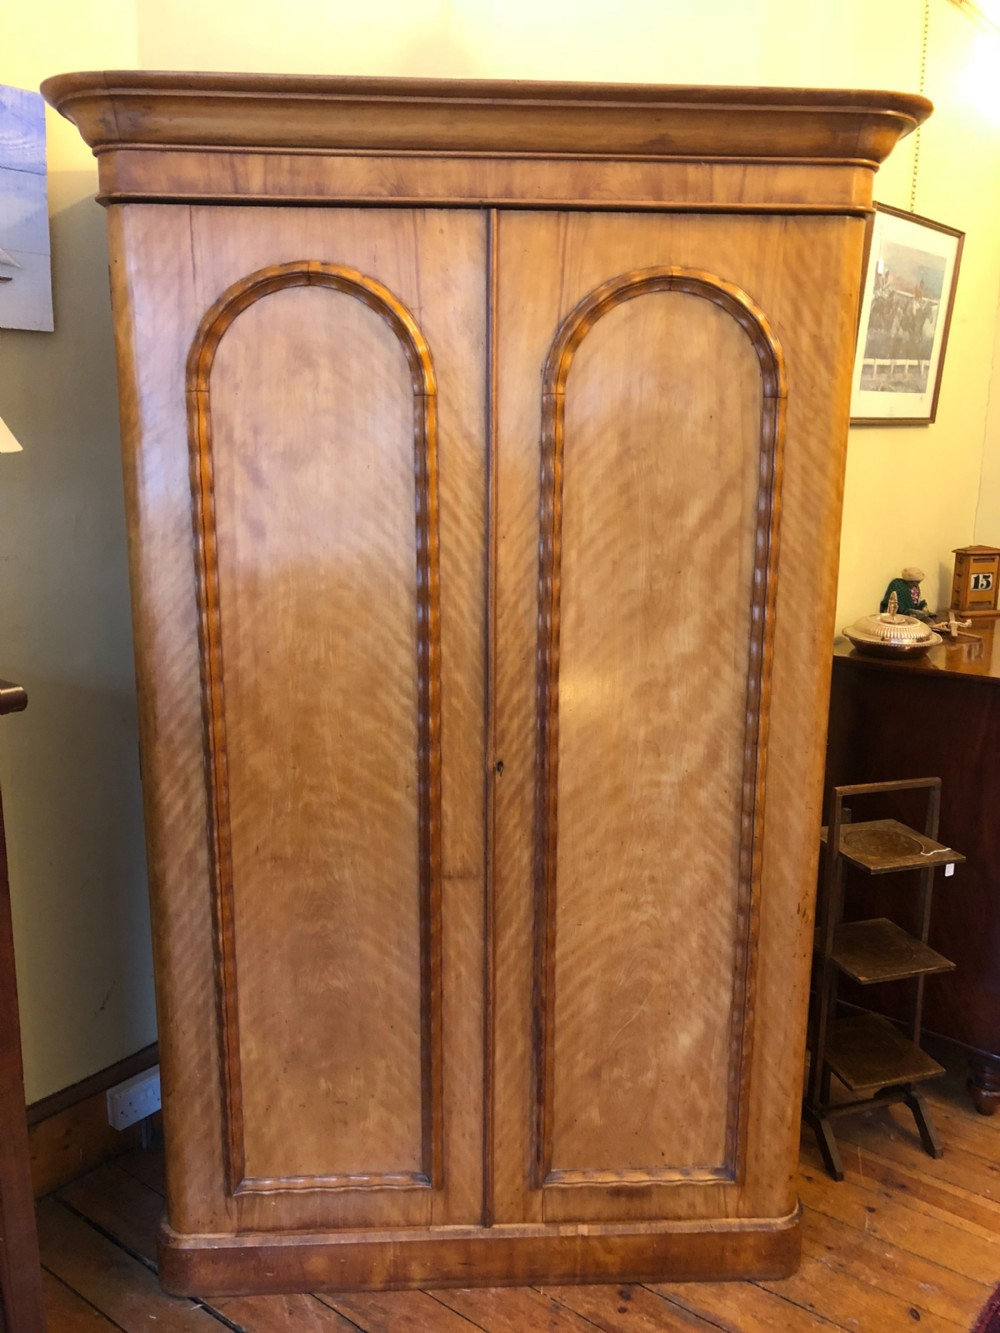 c19th double wardrobe in satin birch